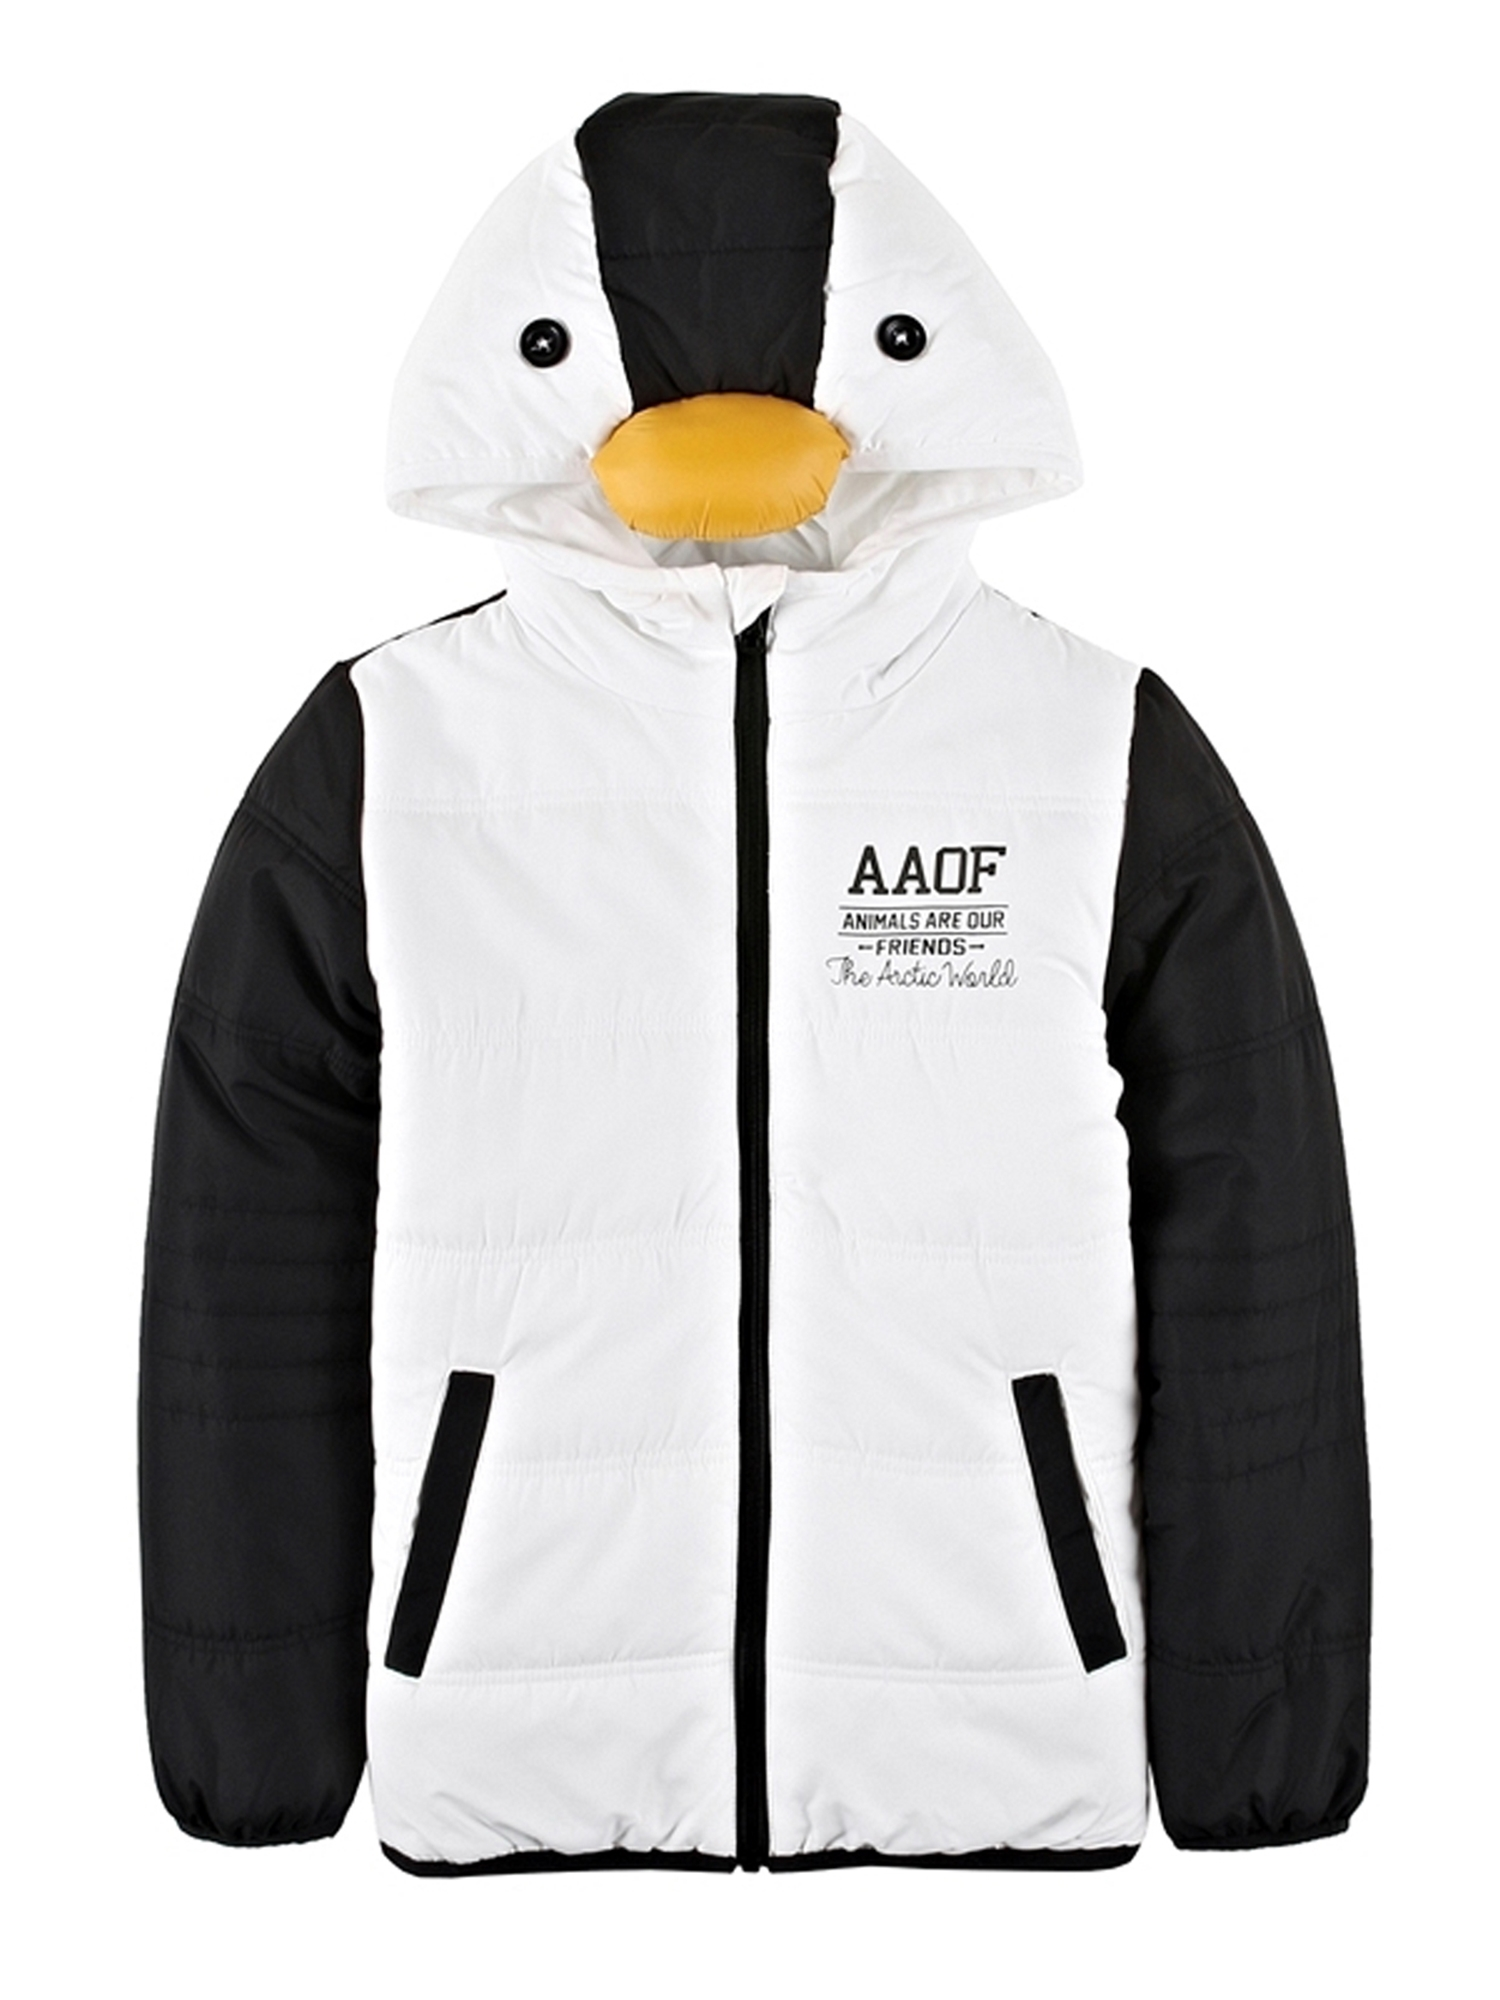 [GIORDANO]ペンギンパデッドジャケット